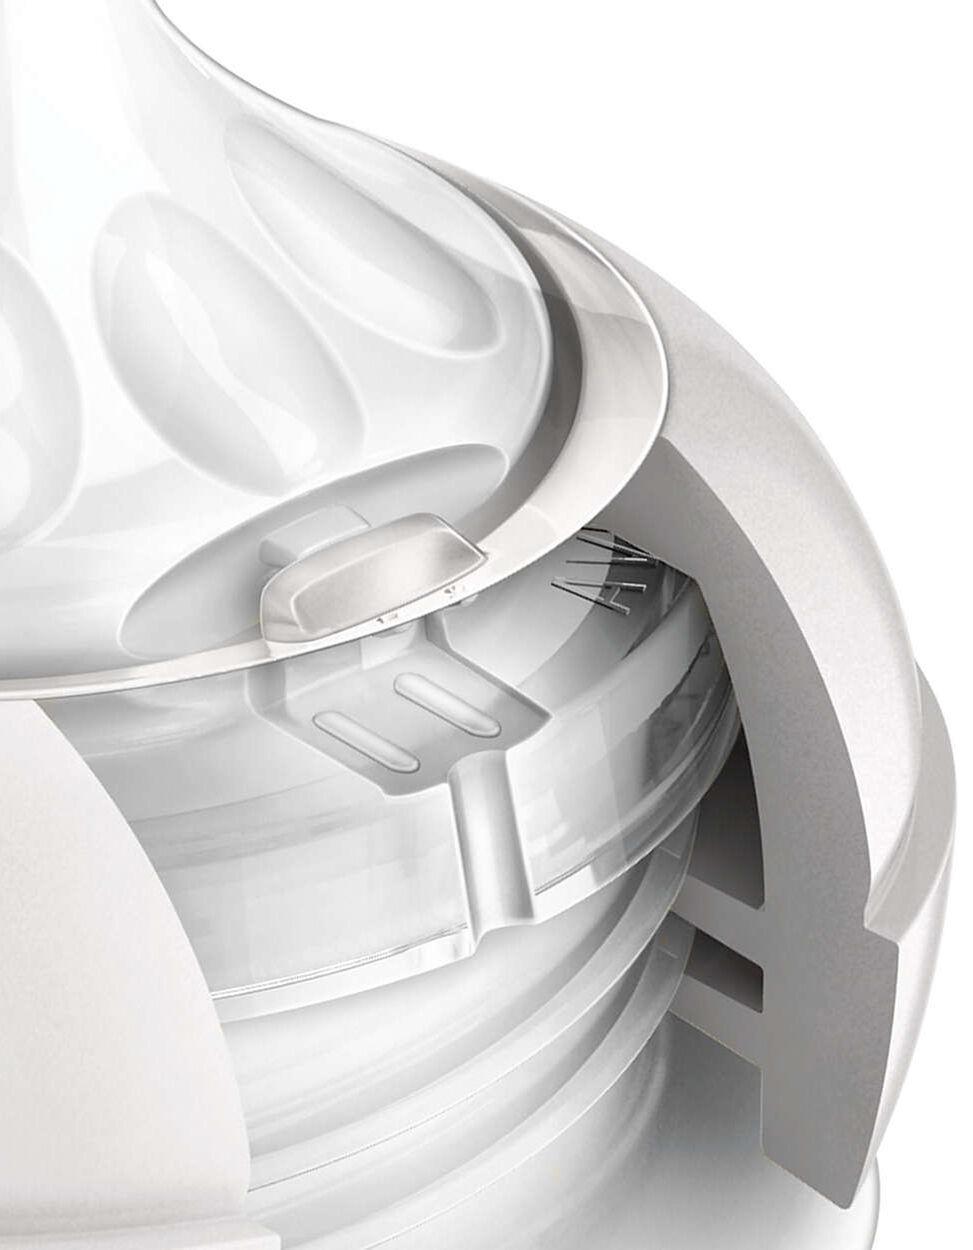 Biberão Natural 330Ml 6M+ Philips/Avent